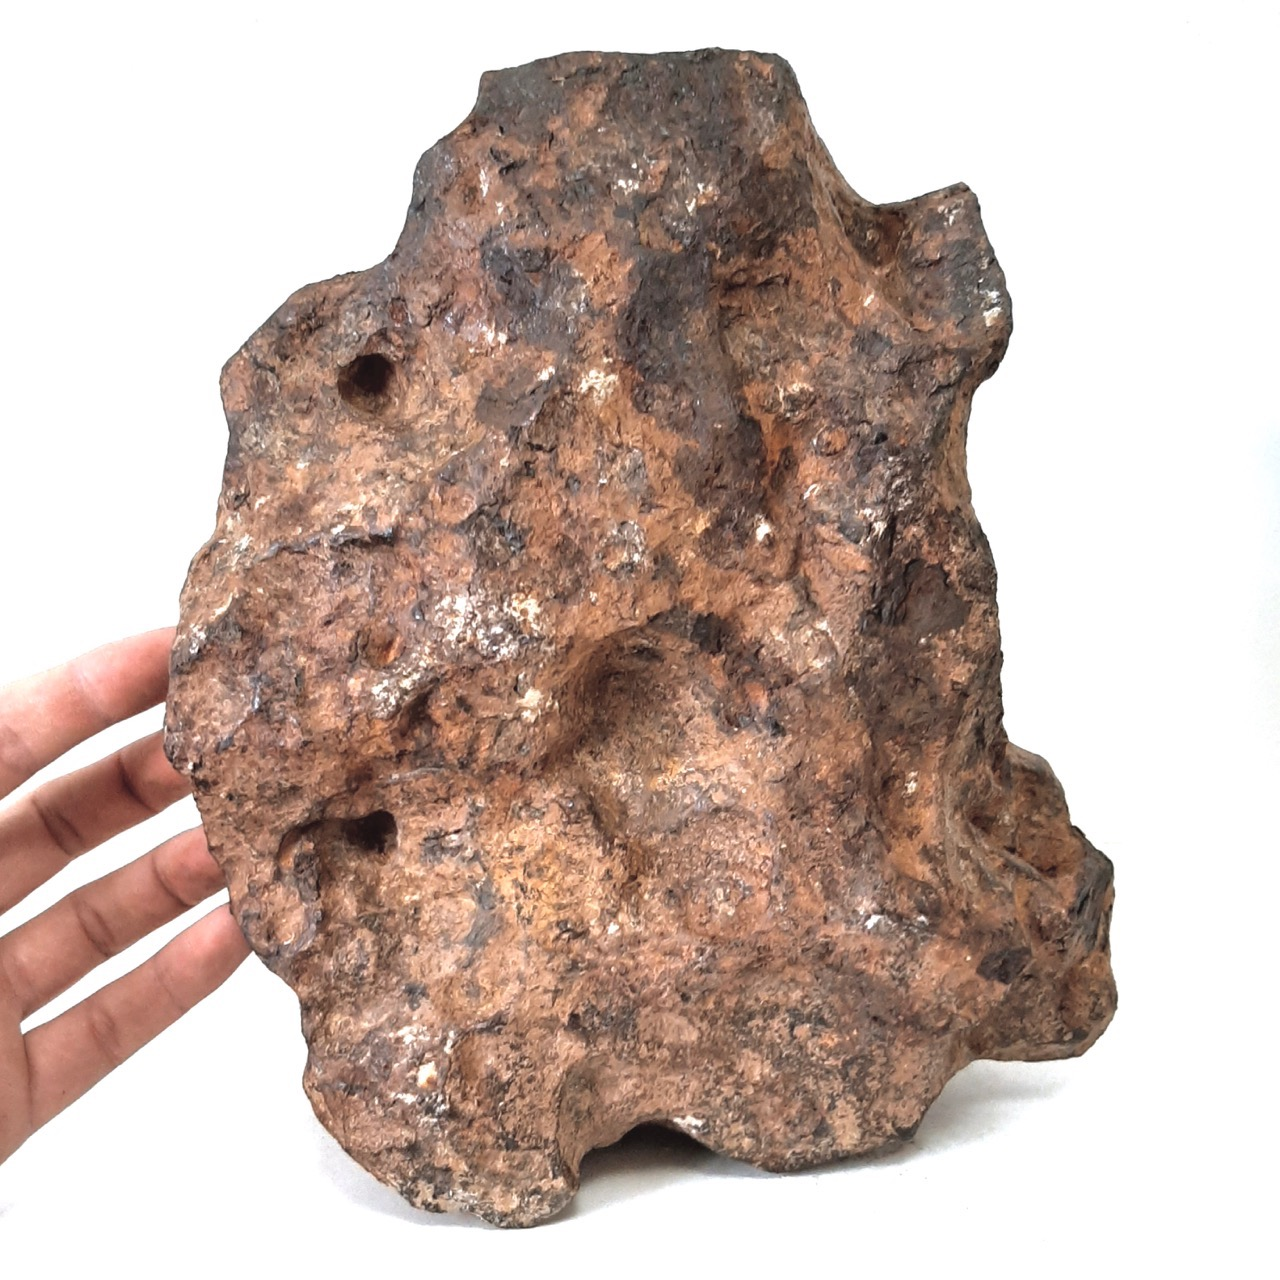 Agoudal meteorite. Museum piece.